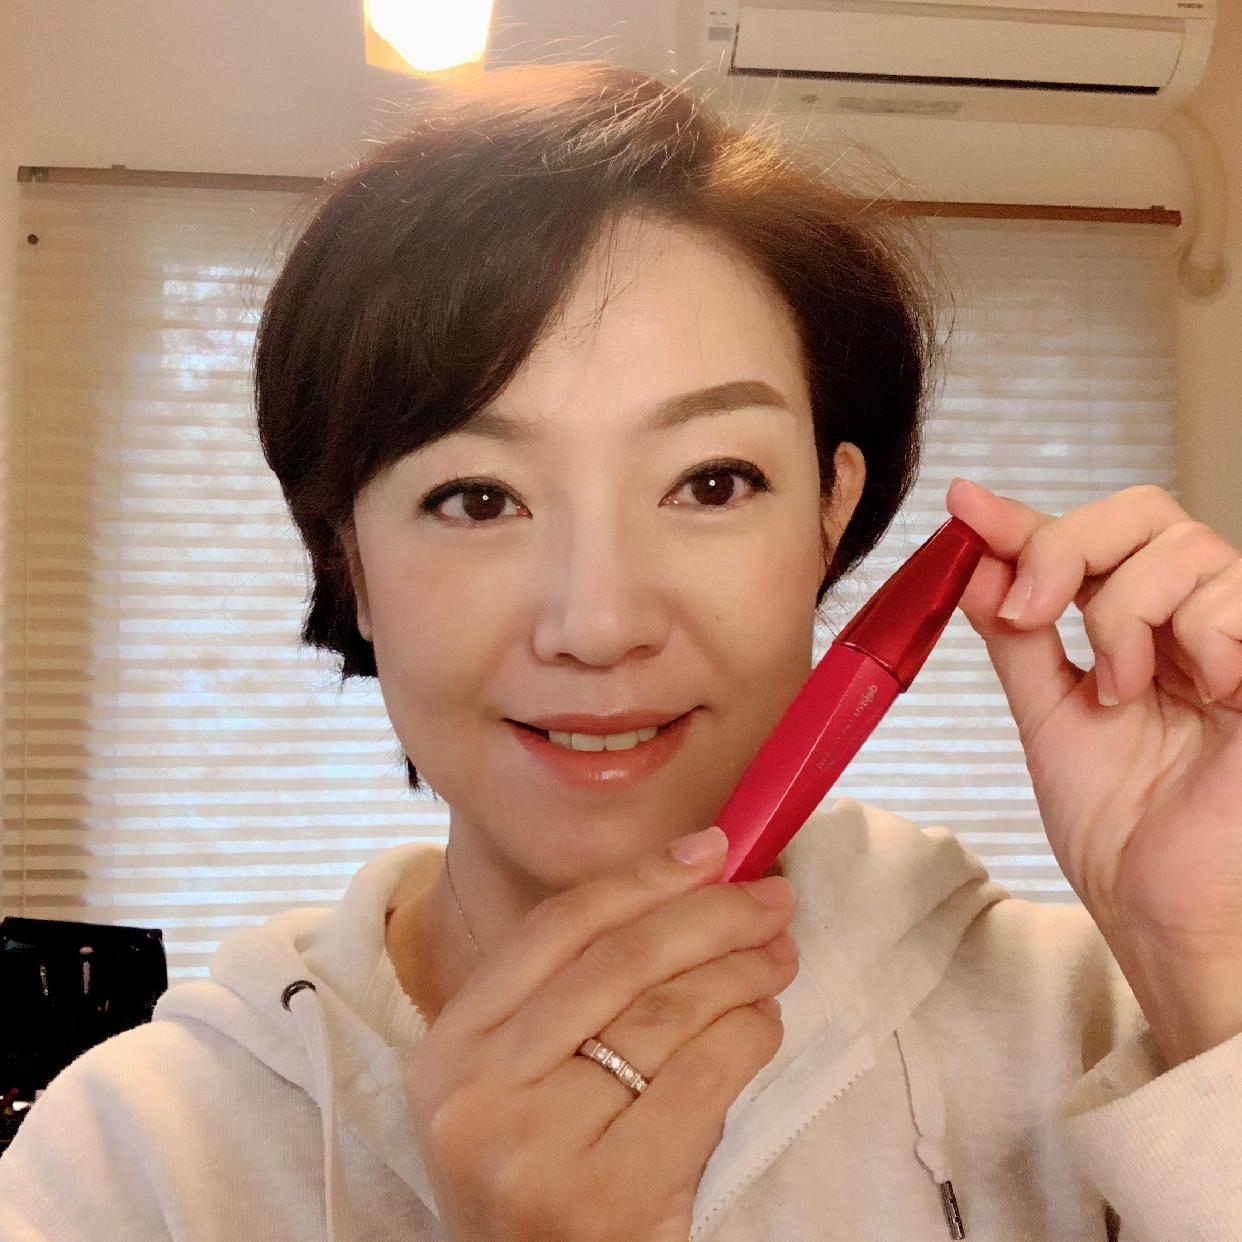 dejavu(デジャヴュ) ラッシュノックアウト エクストラボリュームを使った豊島 あき子さんのクチコミ画像